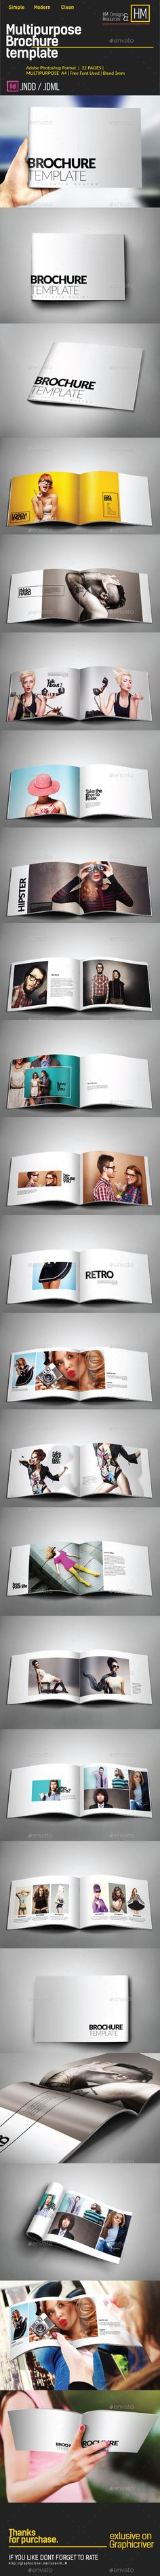 Multipurpose Catalogs / Brochure / Portfolio #photographer #clean  • Download here → https://graphicriver.net/item/multipurpose-catalogs-brochure-portfolio/10863847?ref=pxcr